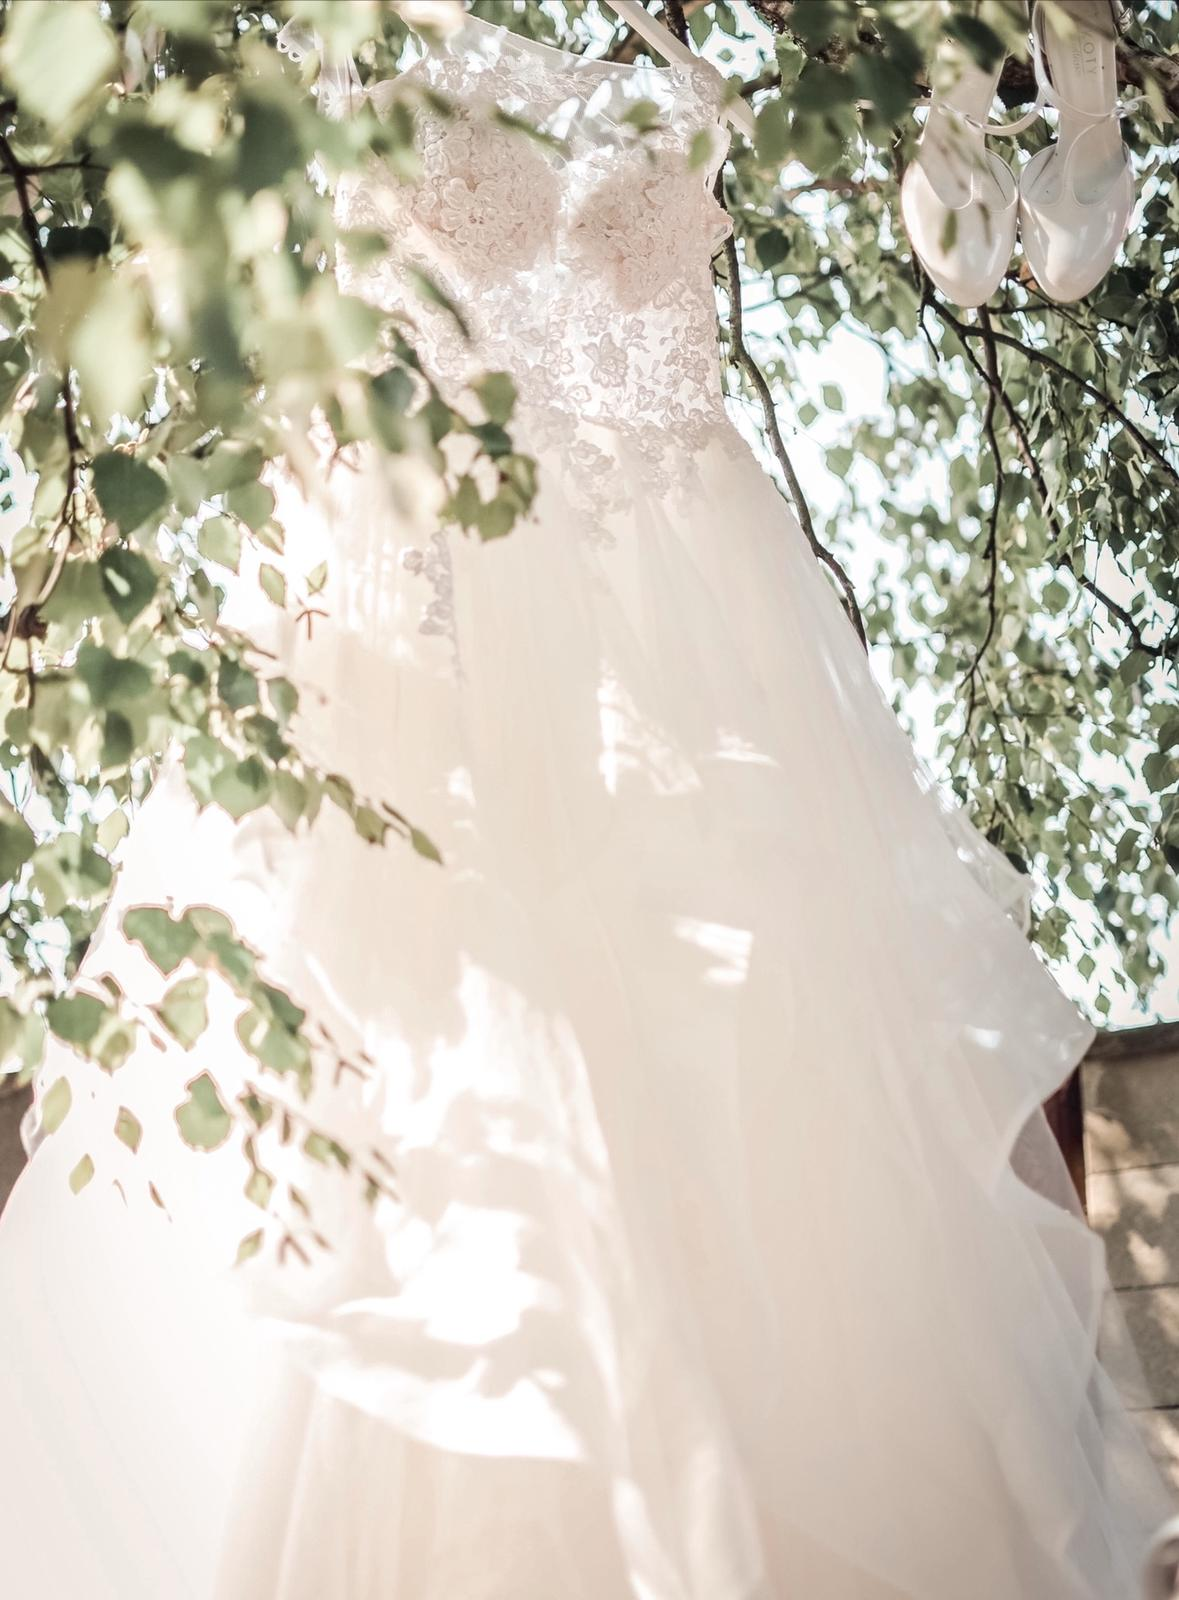 svatbysusmevem - Obrázek č. 4